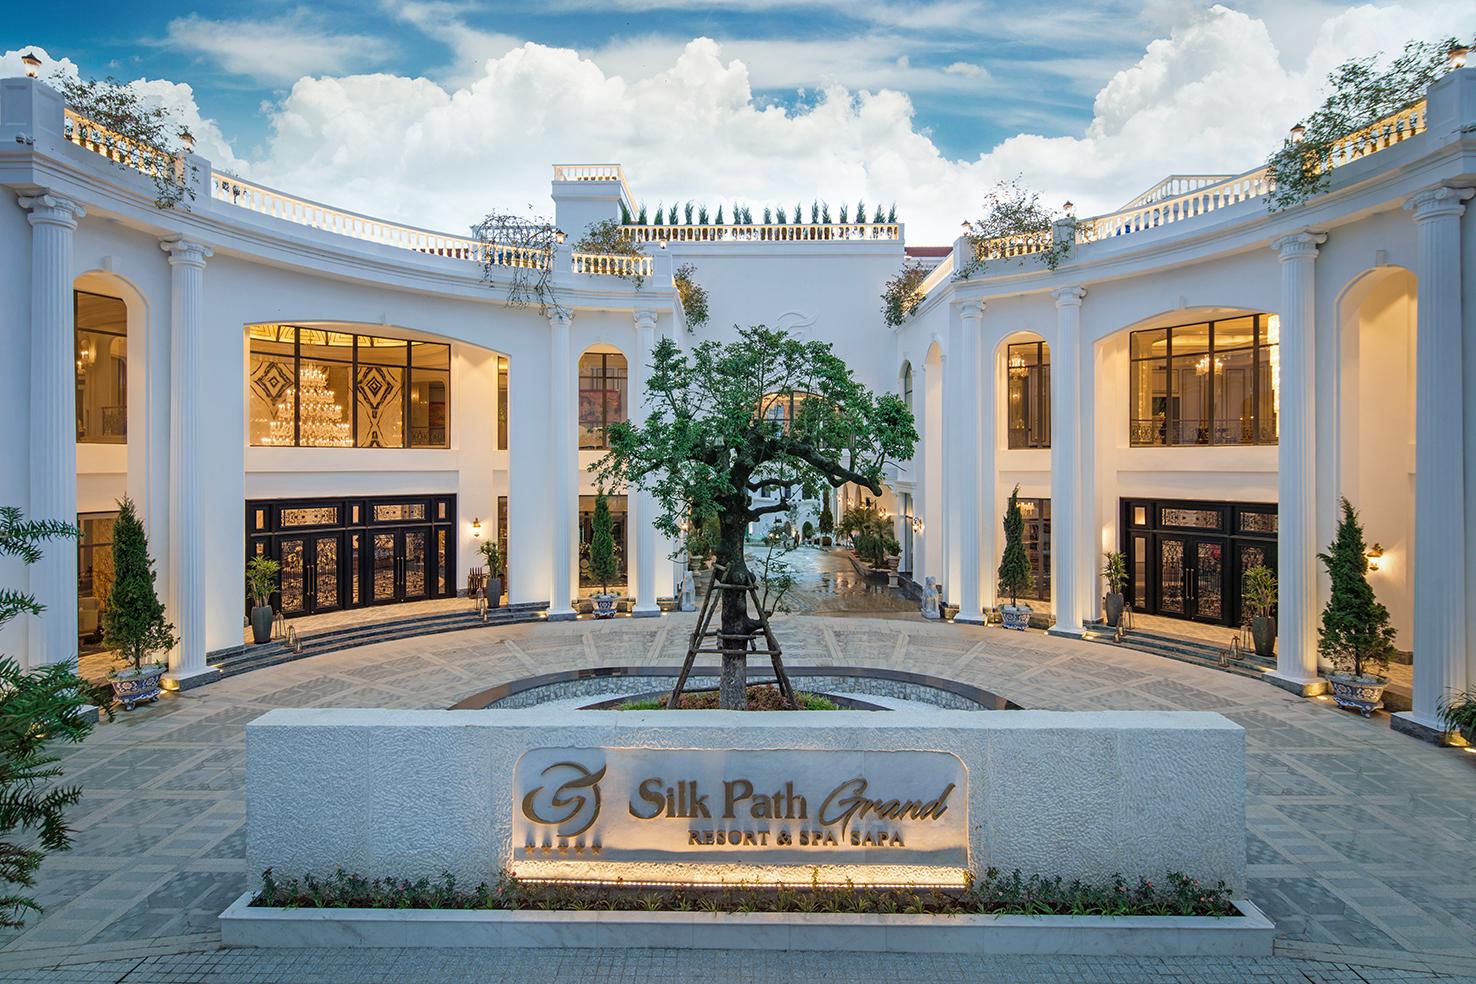 silk-path-grand-resort-ivivu-4